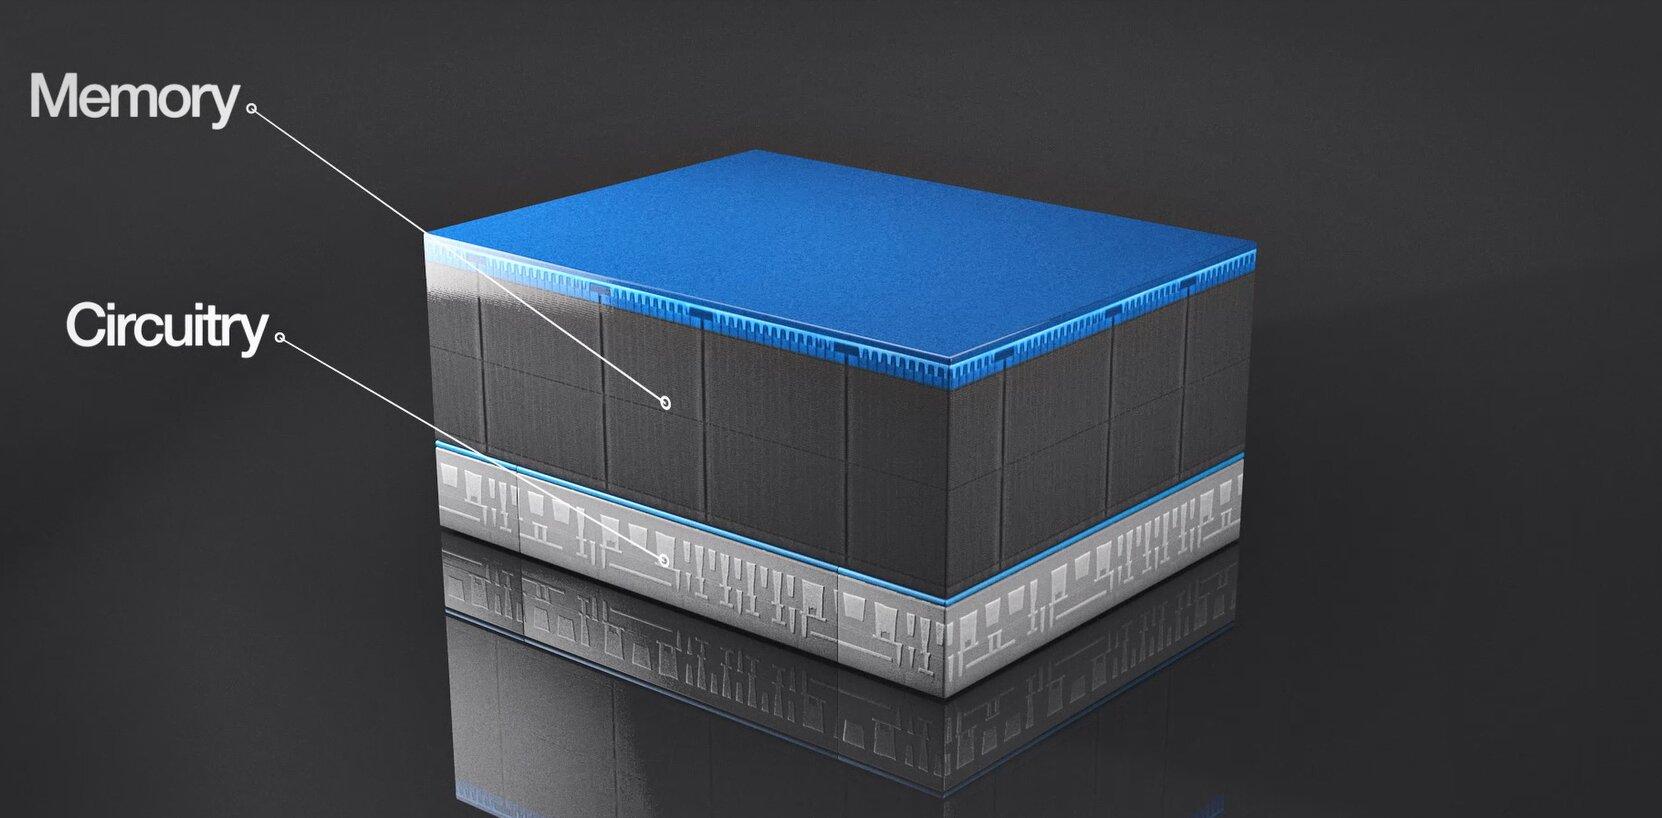 NAND de 176 capas de micrones